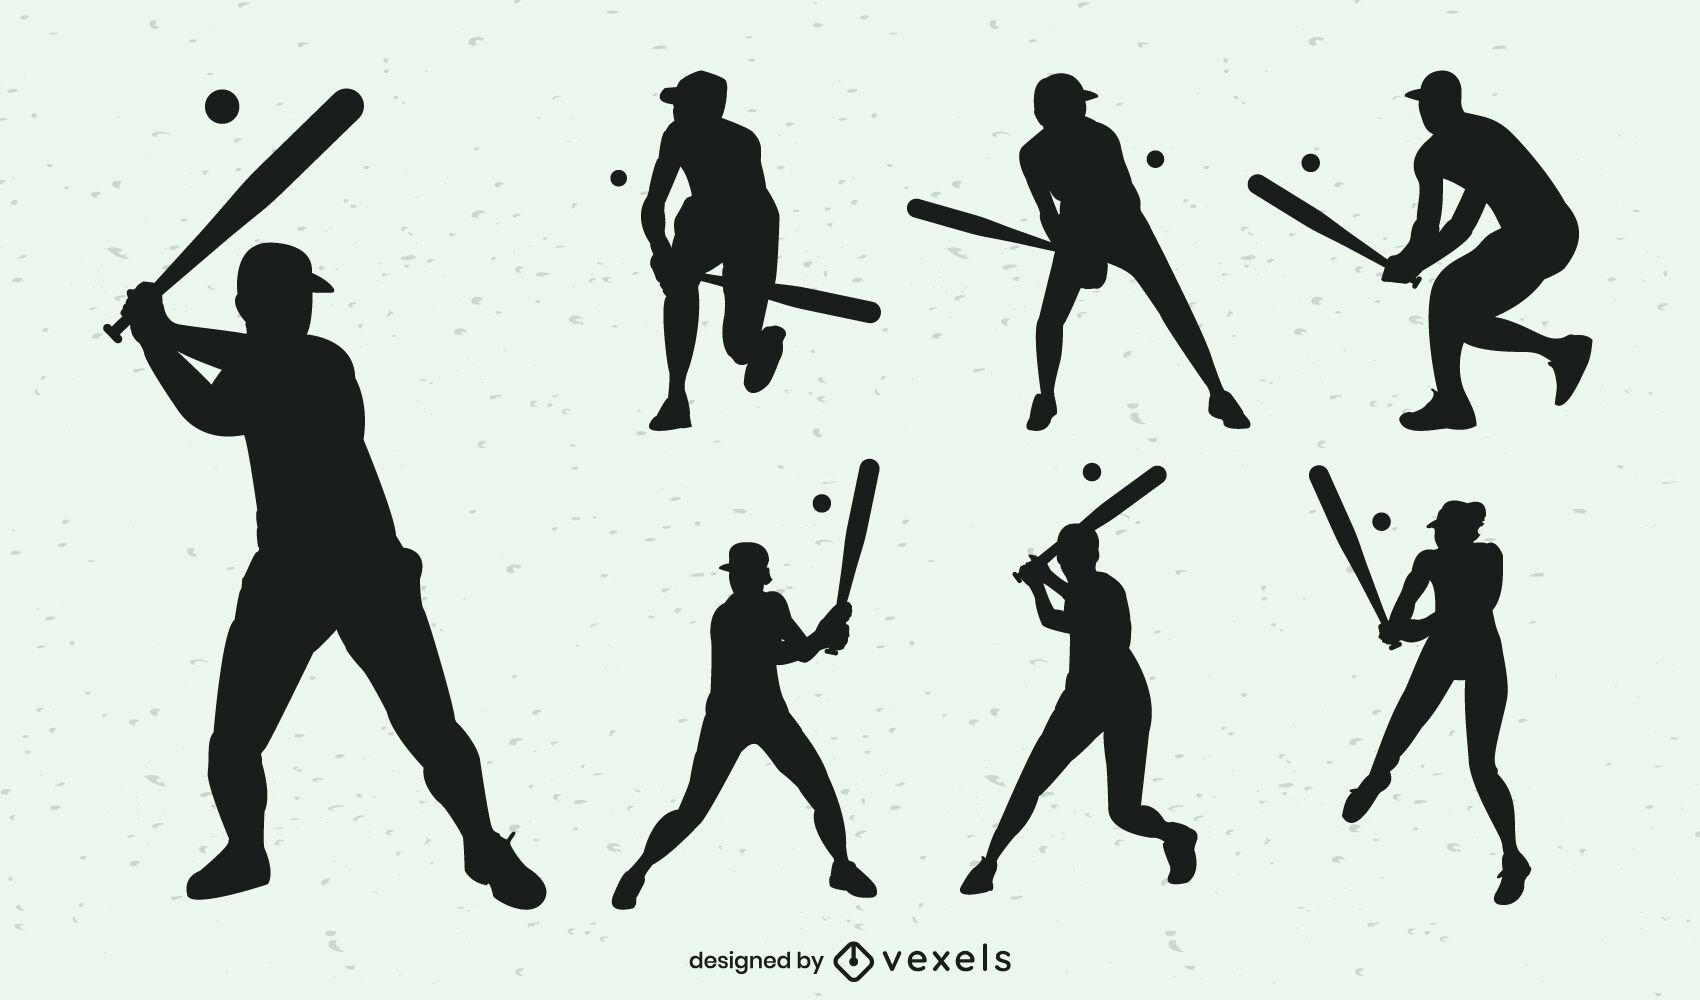 Baseball batting position silhouettes